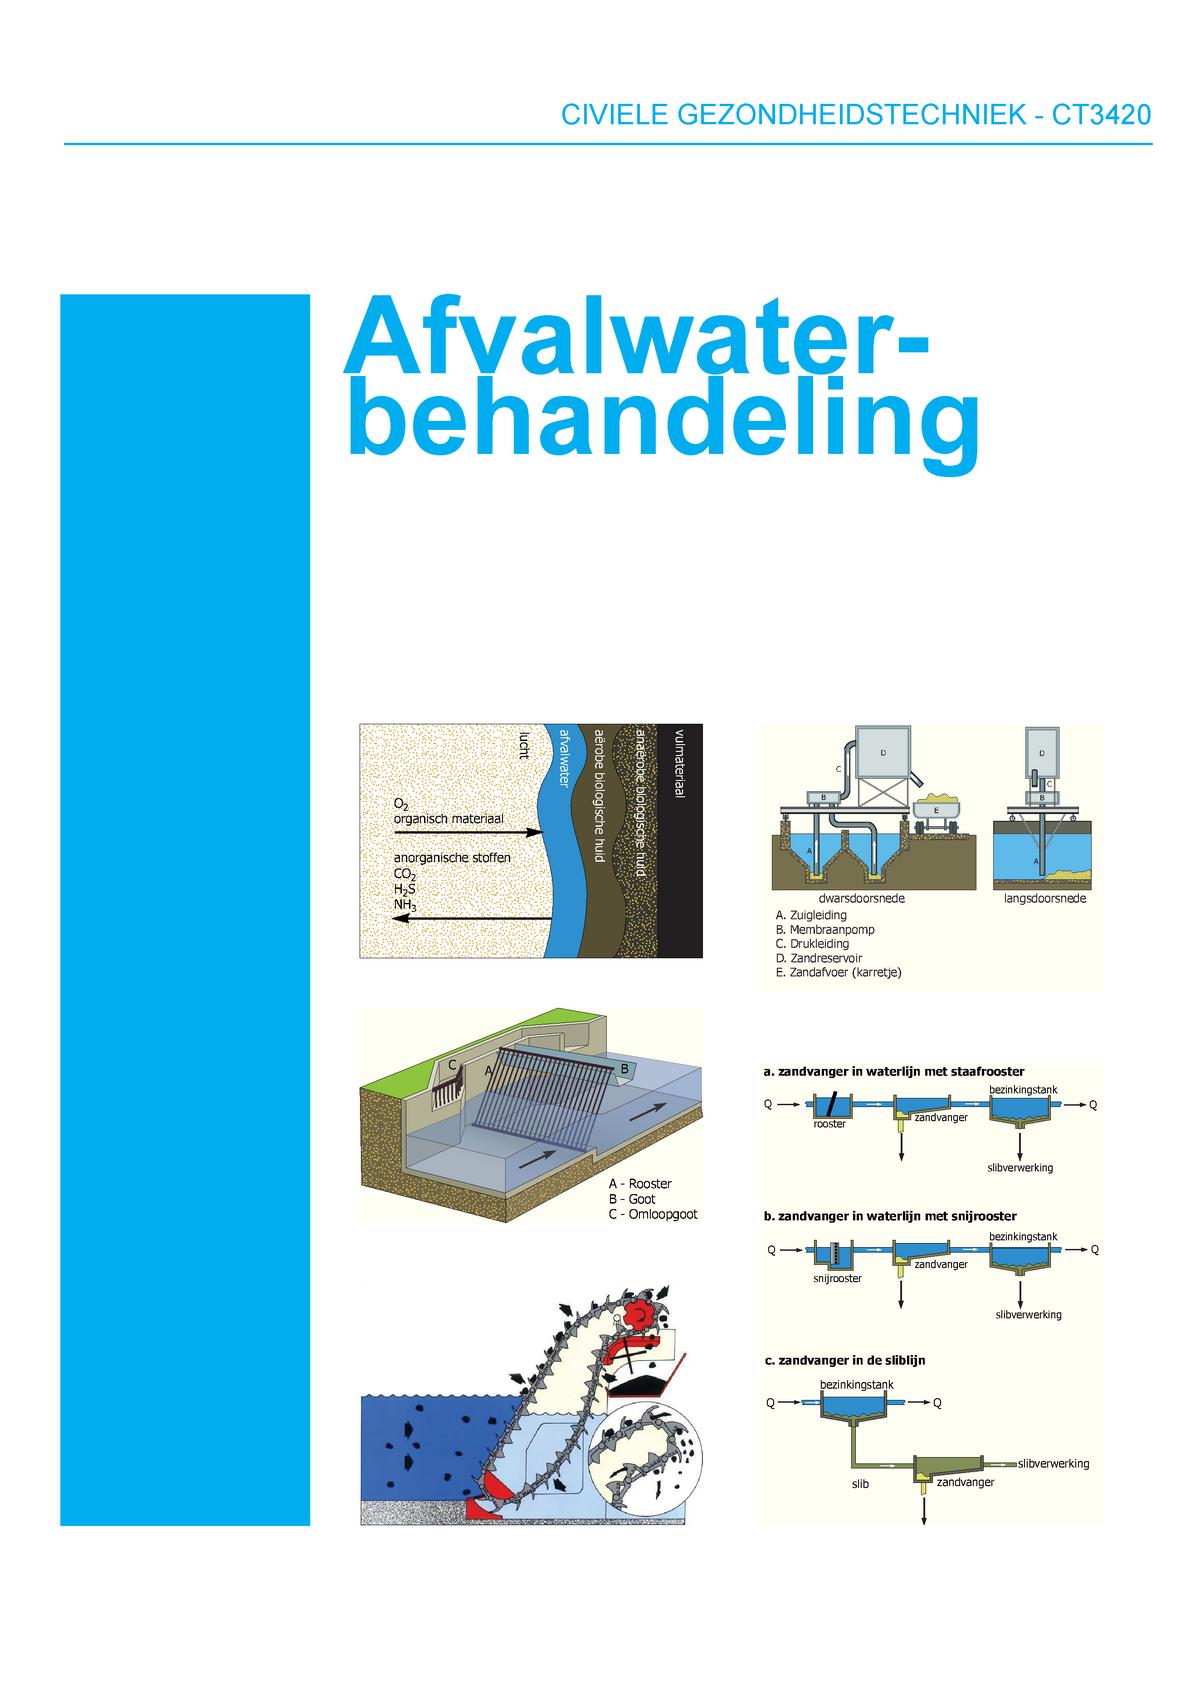 Artikel Gezondheidstechniek Afvalwaterbehandeling Studeersnel